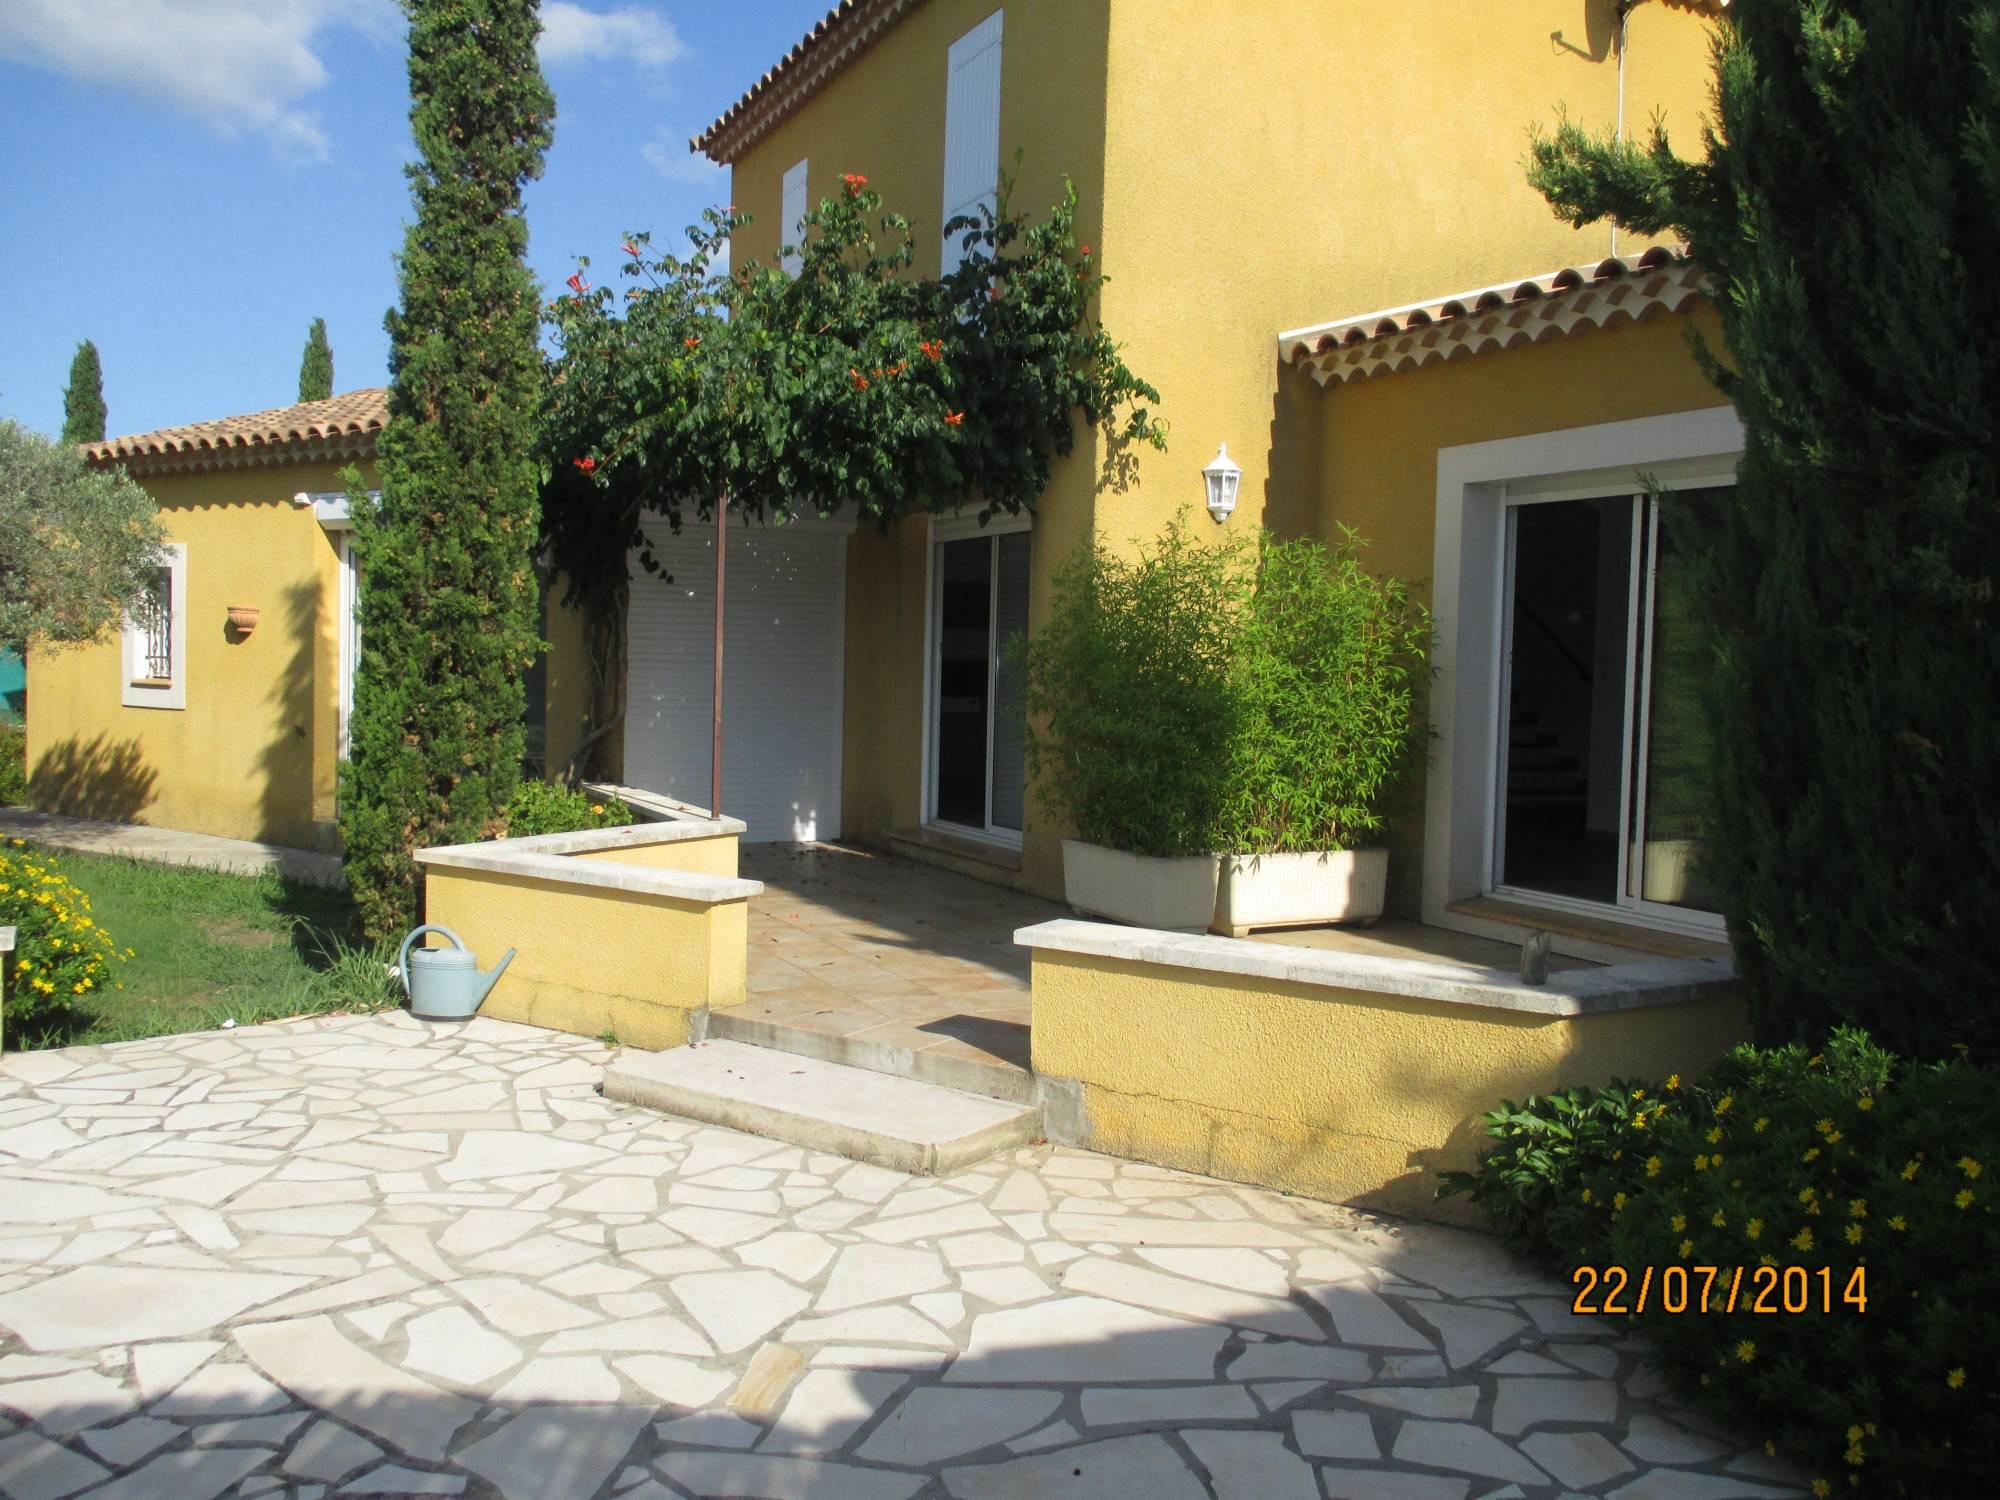 Villa de charme 5 saint martin de crau 13310 en campagne for Piscine saint martin de crau